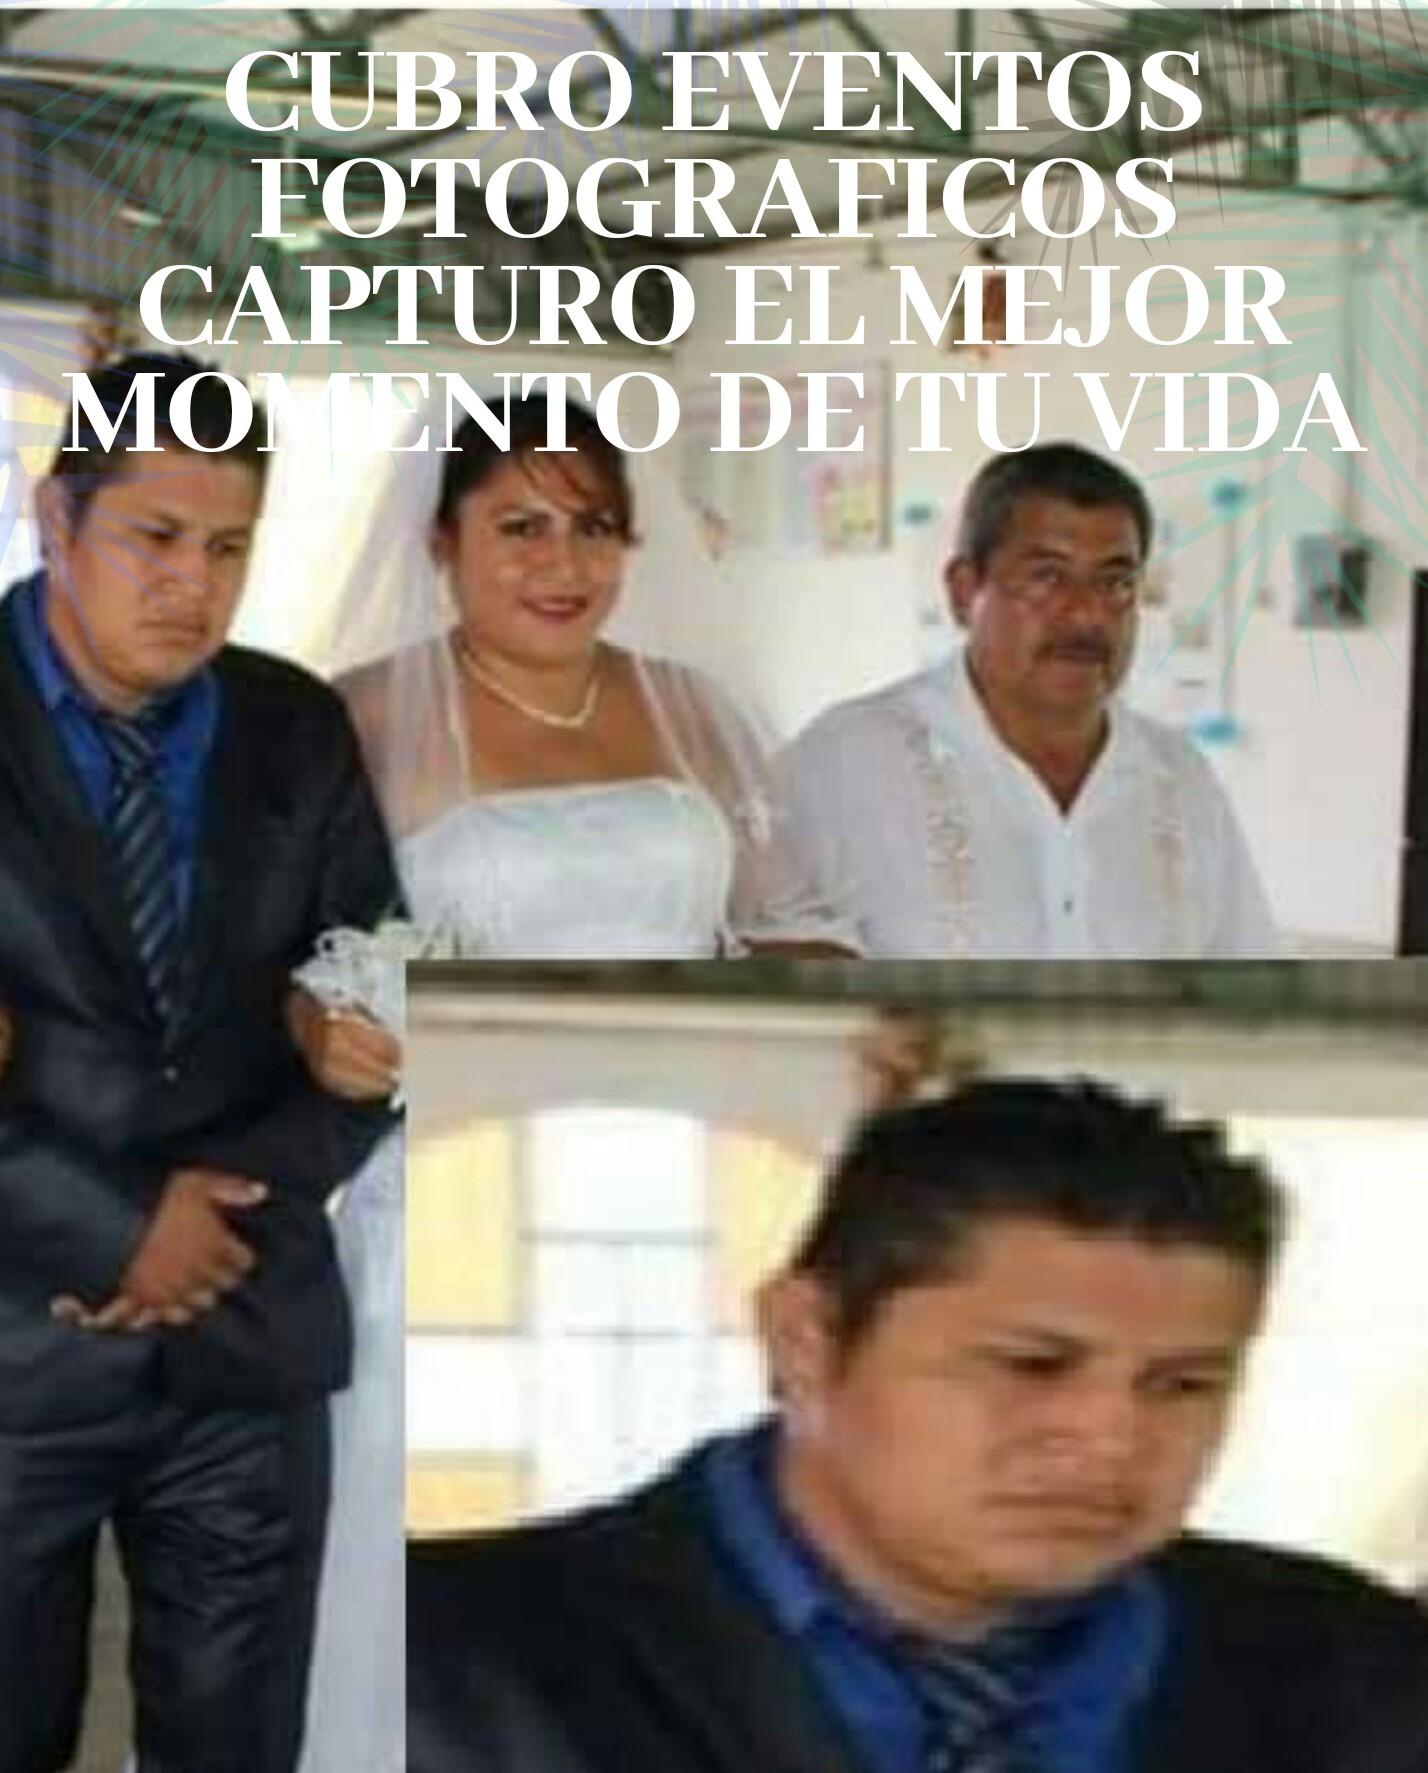 Momento magico xd - meme